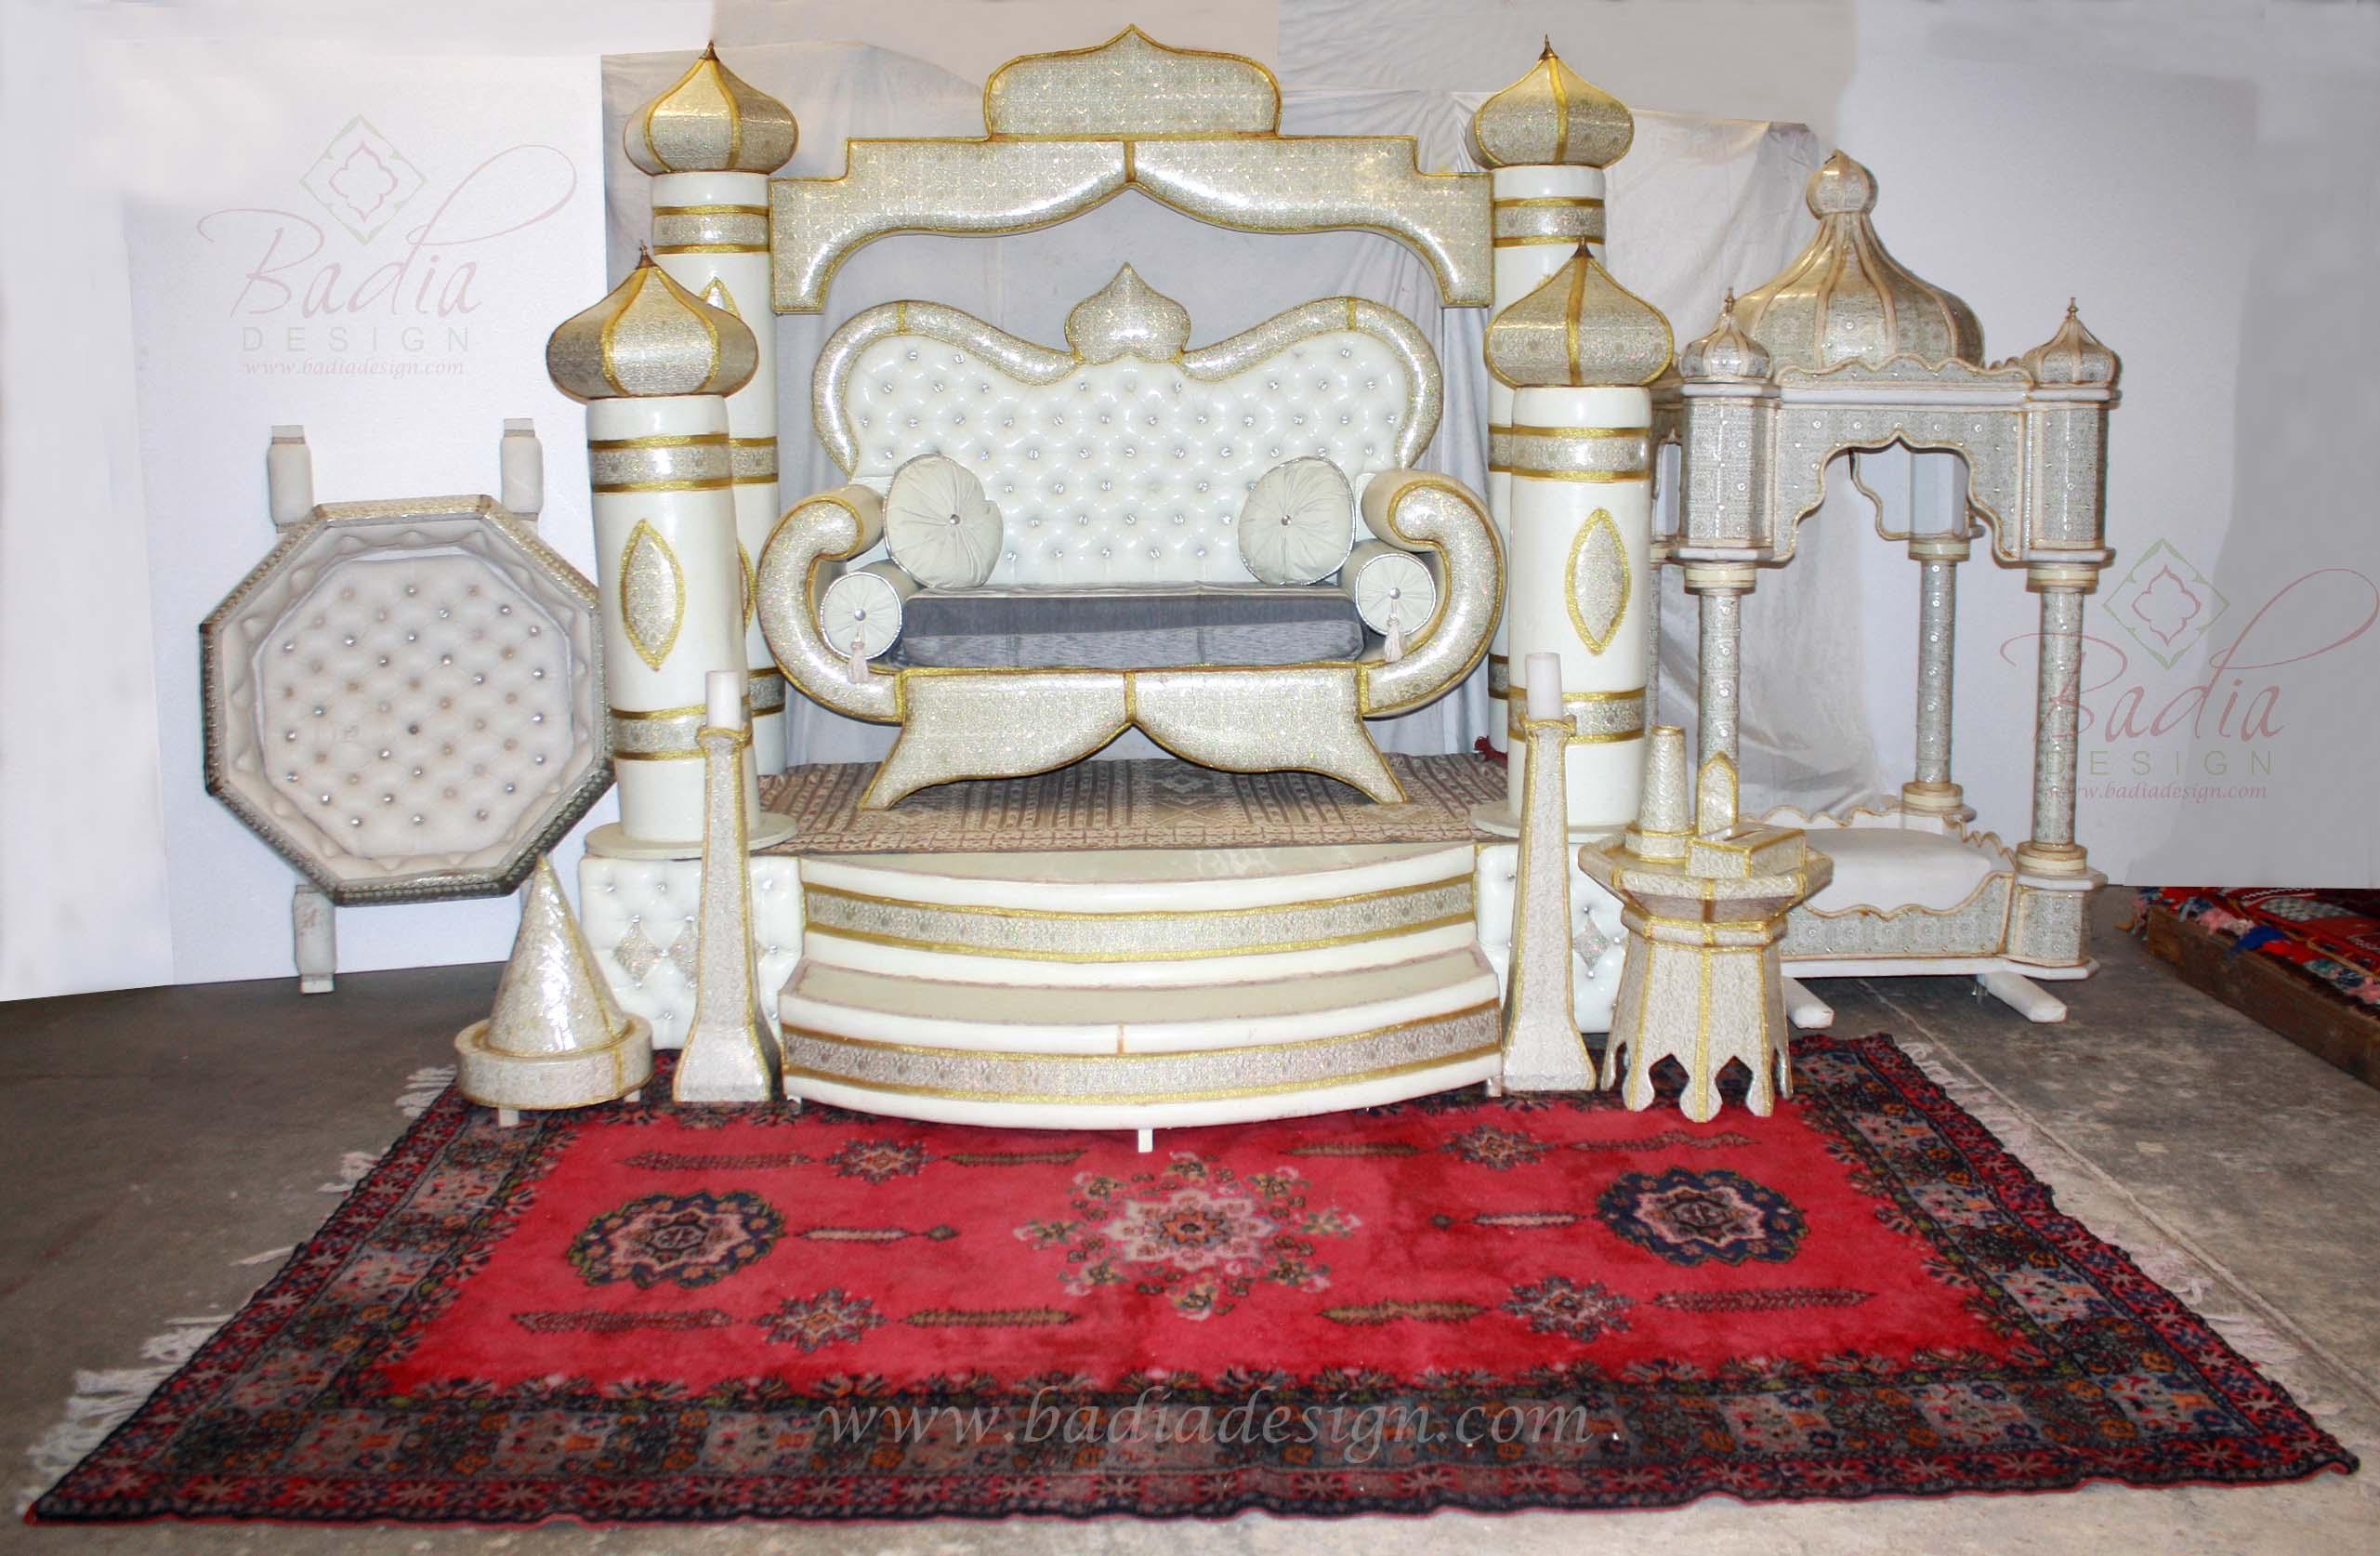 Authentic Moroccan Wedding Decorations, Authentic Moroccan Wedding Décor,  Wedding Furniture, Moroccan Wedding Décor